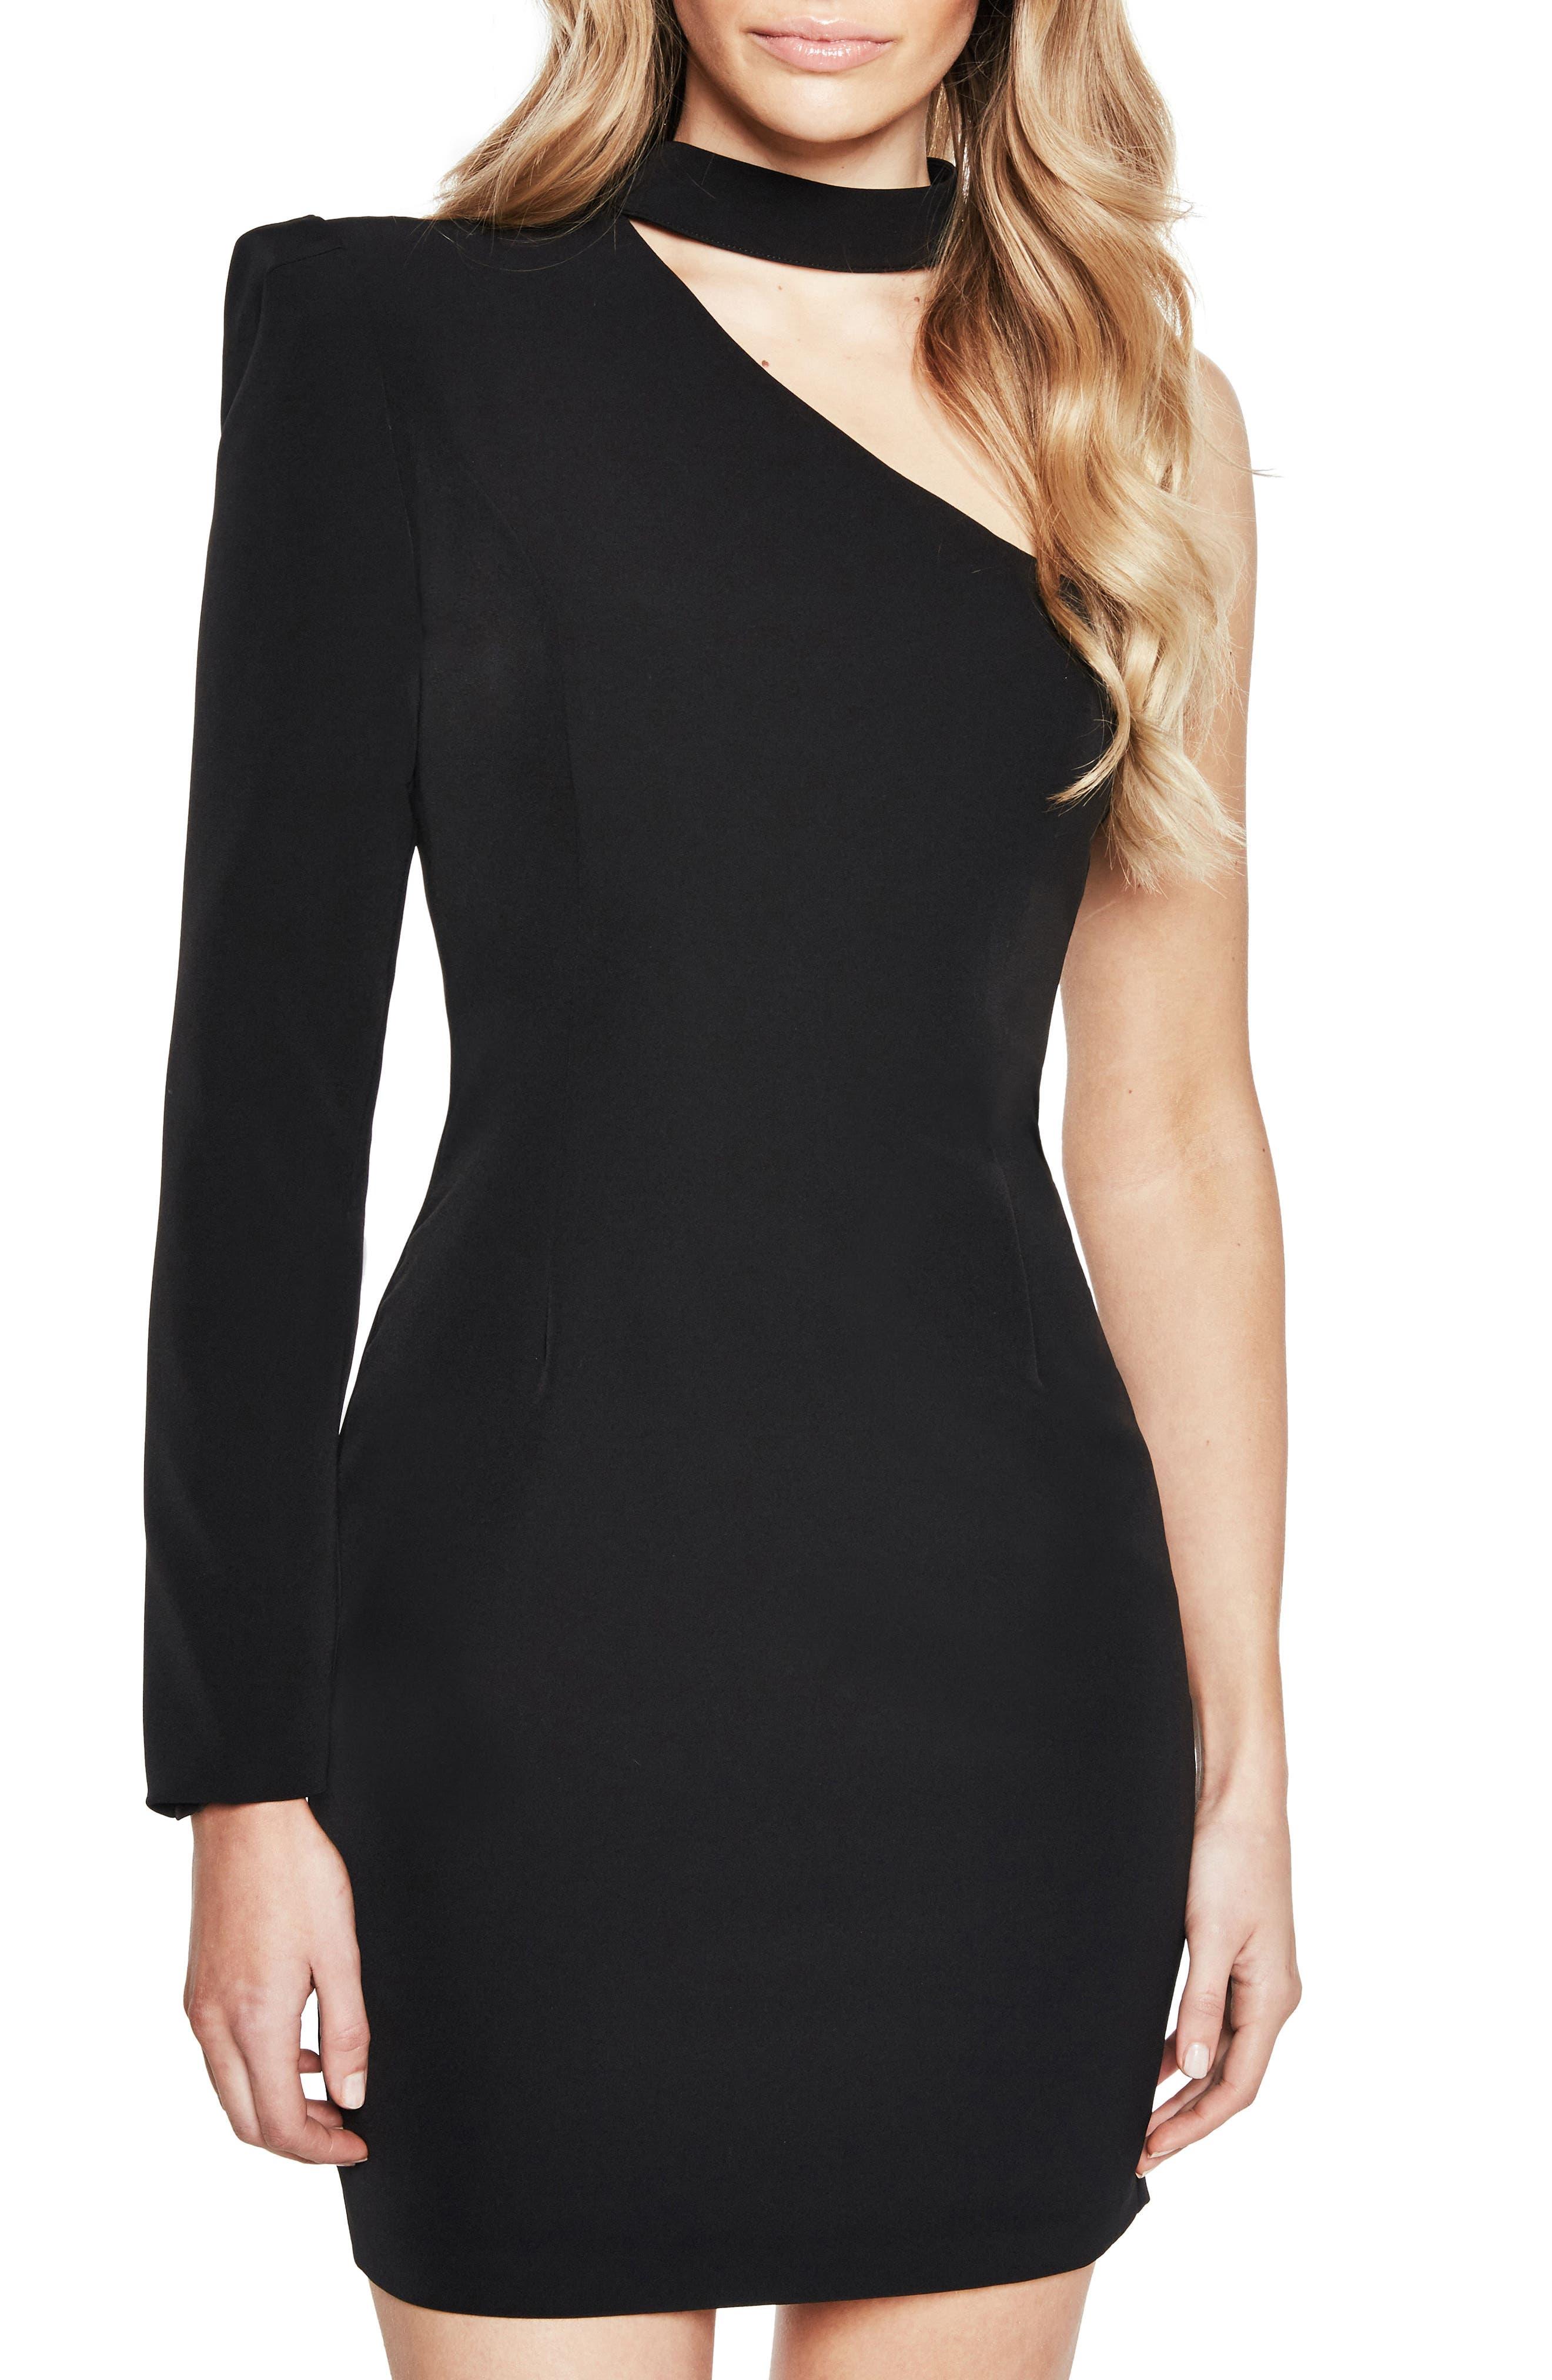 Willow One-Shoulder Choker Dress,                         Main,                         color, Black